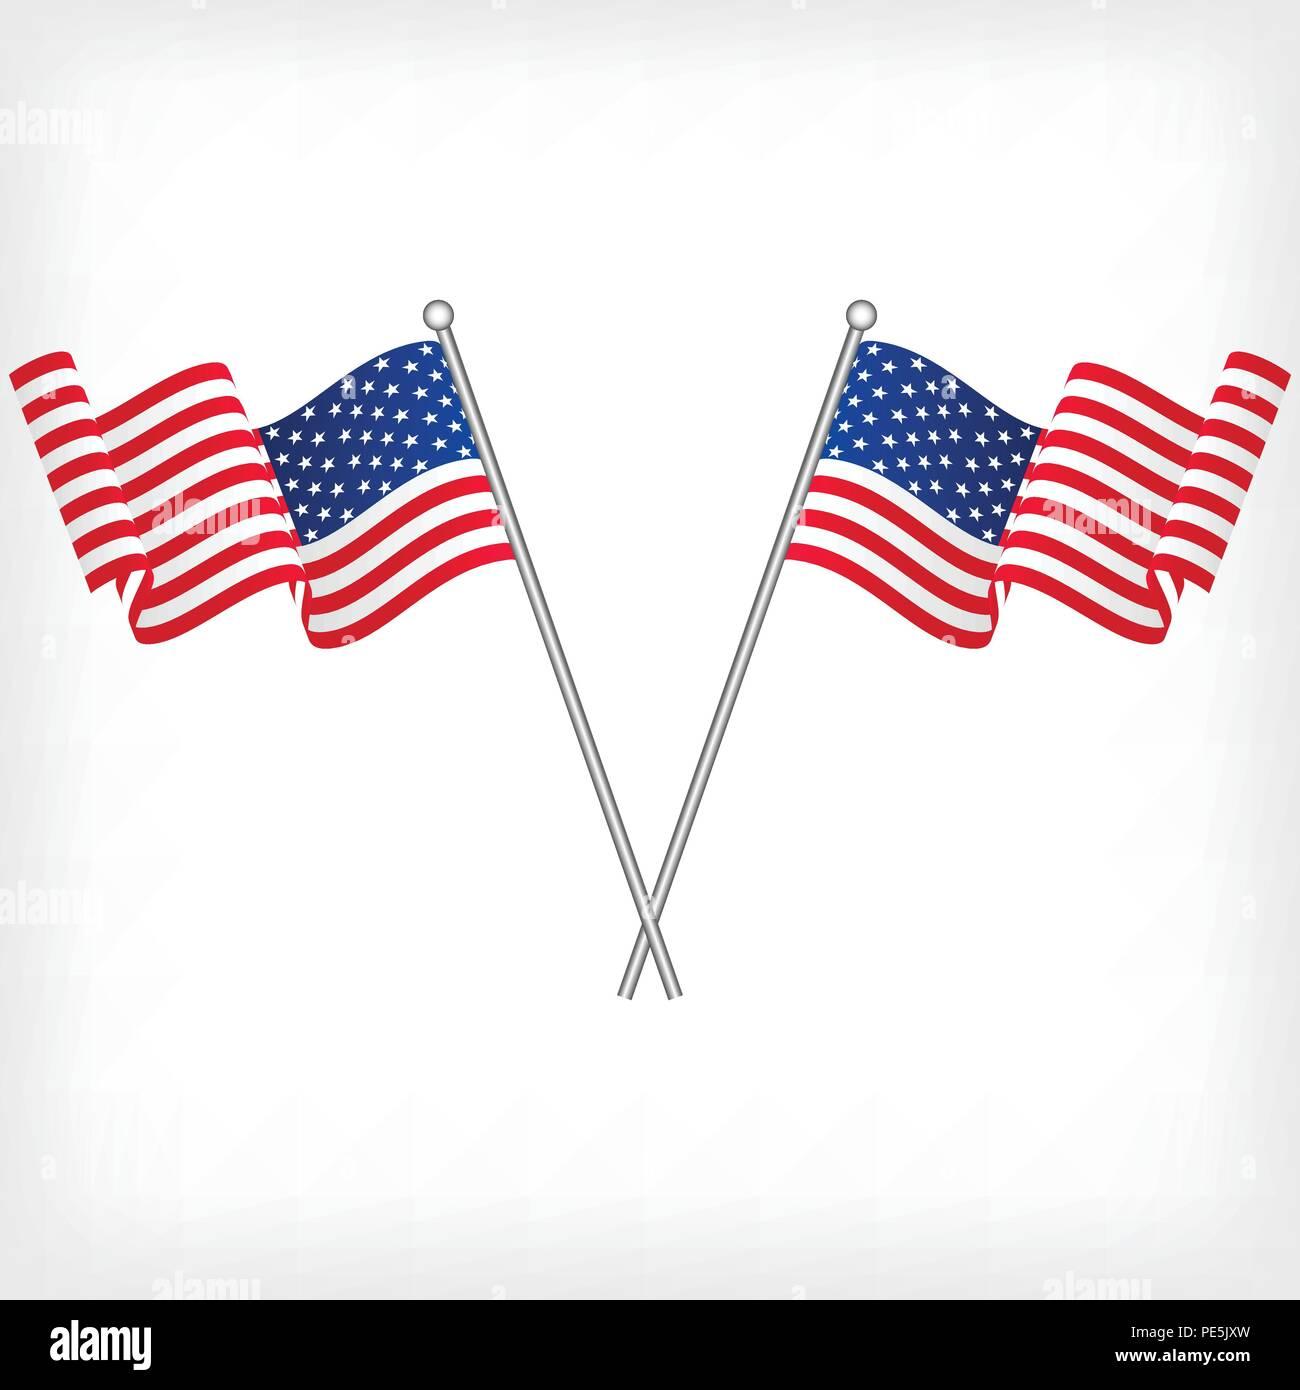 National Symbols Of The United States Stock Photos National